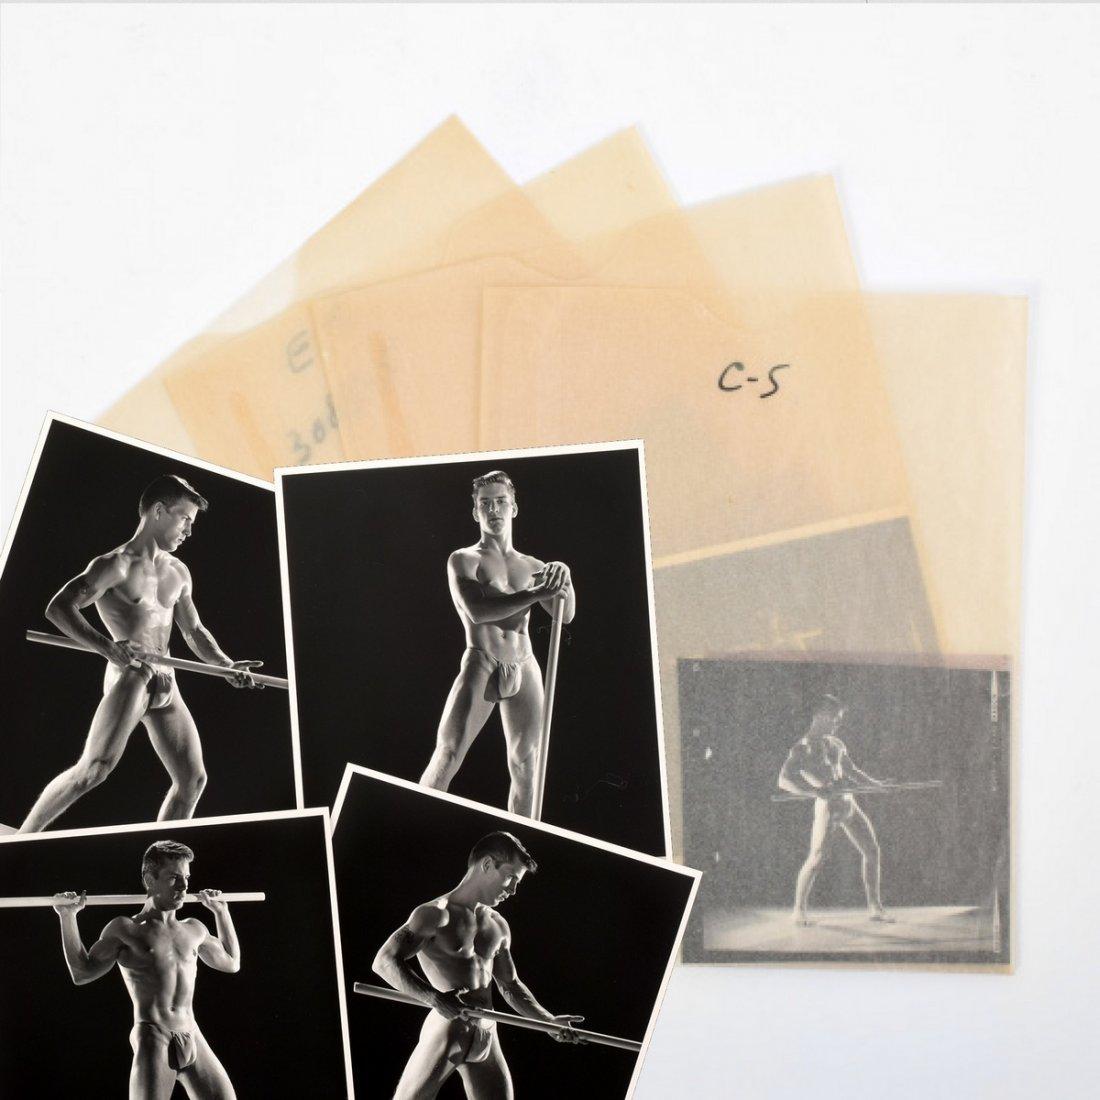 4 Joe Dallesandro Photos & Negatives, Bruce Bellas